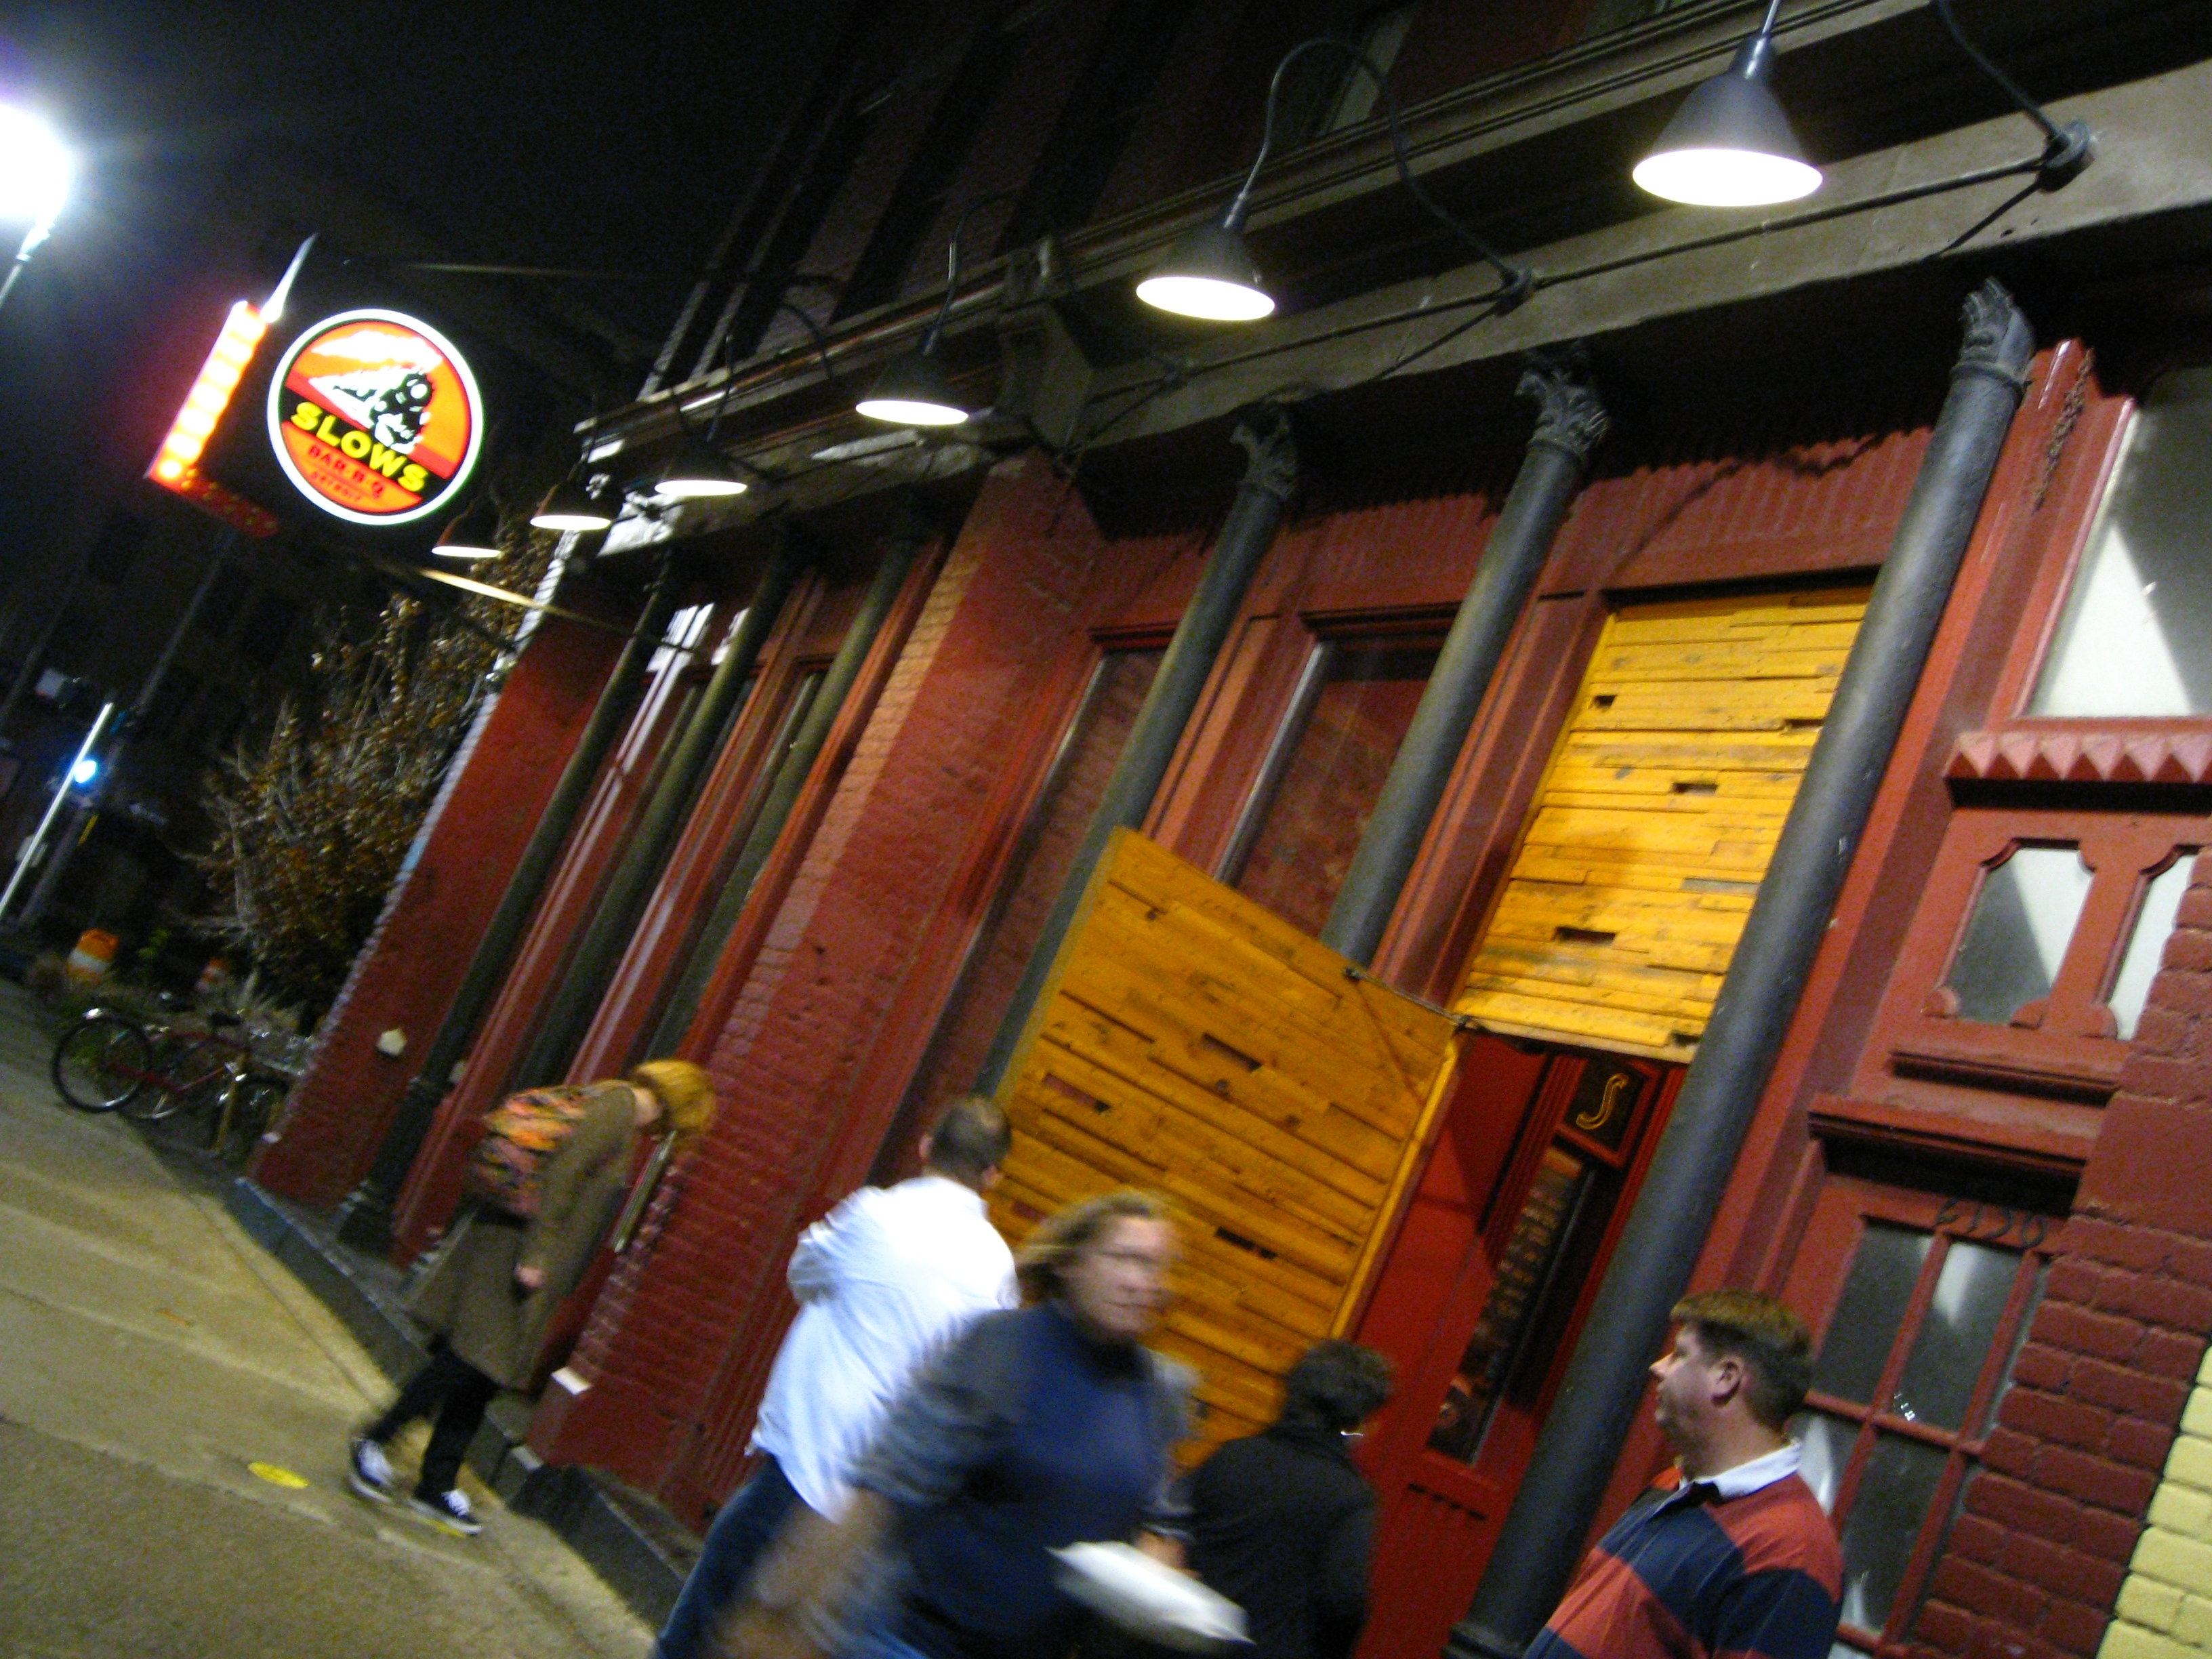 Motor city bar and grill warren mi for Motor bar and restaurant